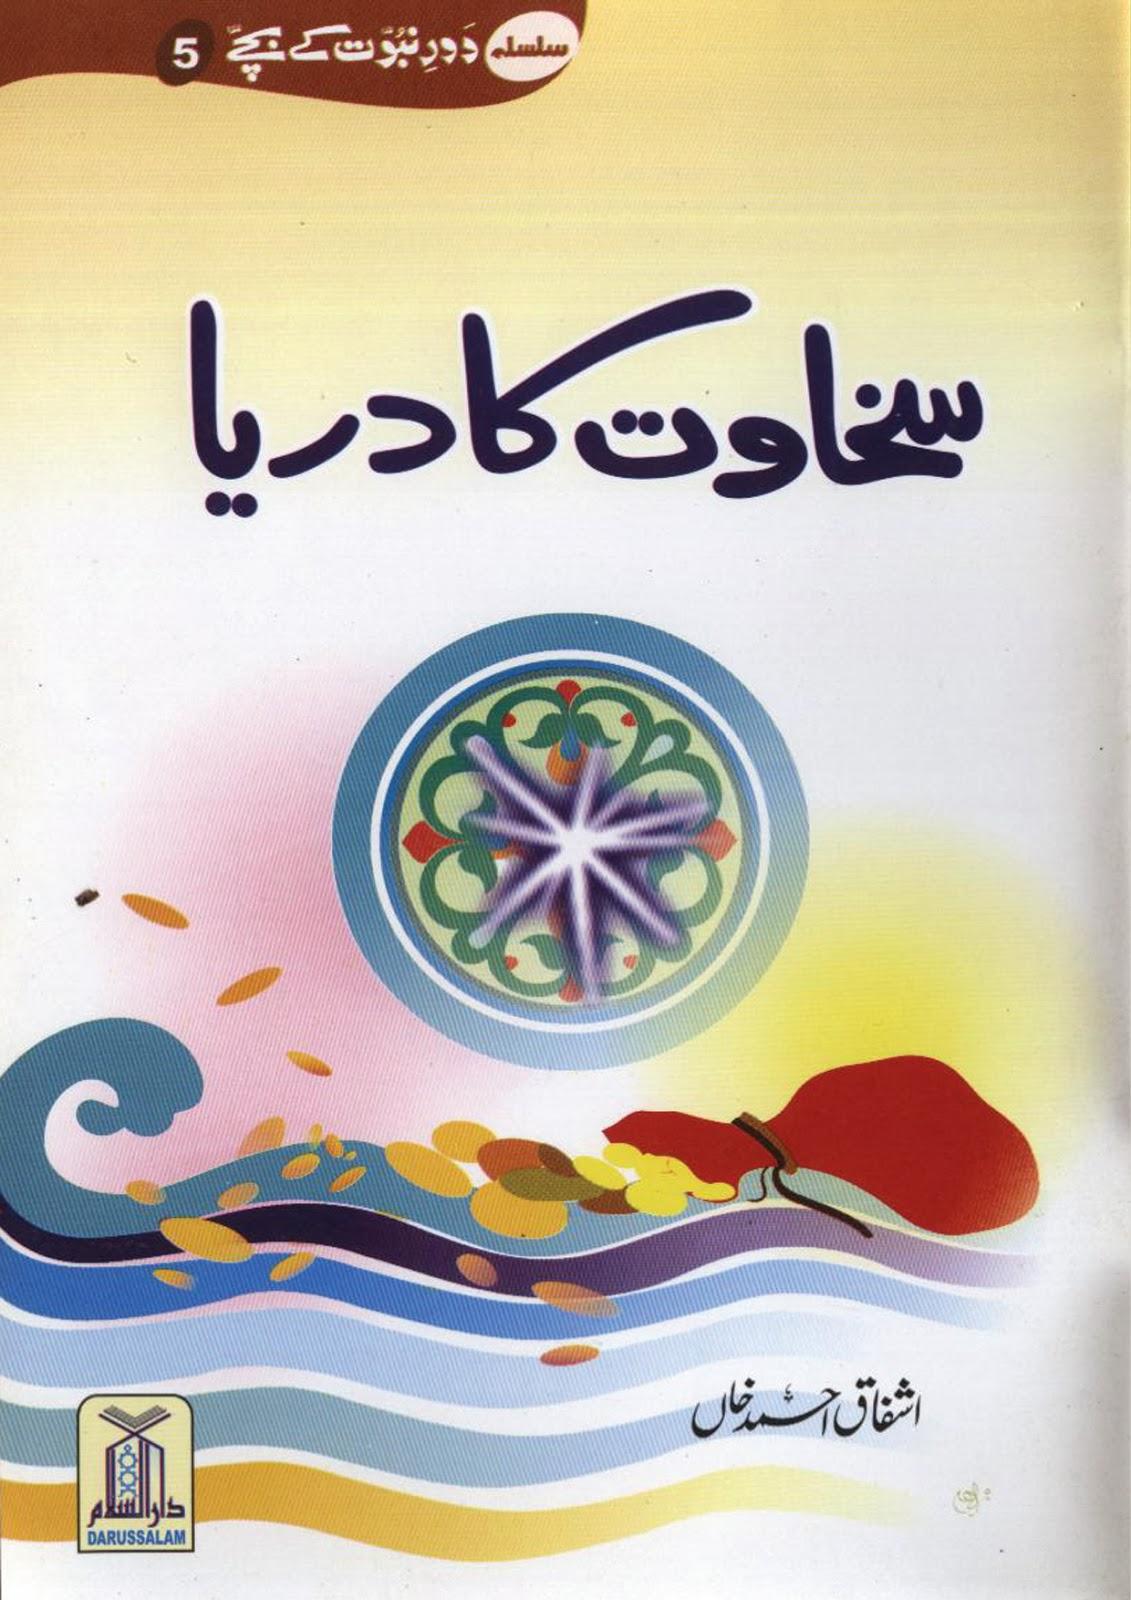 http://urduguru1.blogspot.com/2014/02/sakhwat-ka-darya-abdullah-ibn-jafar-ra.html